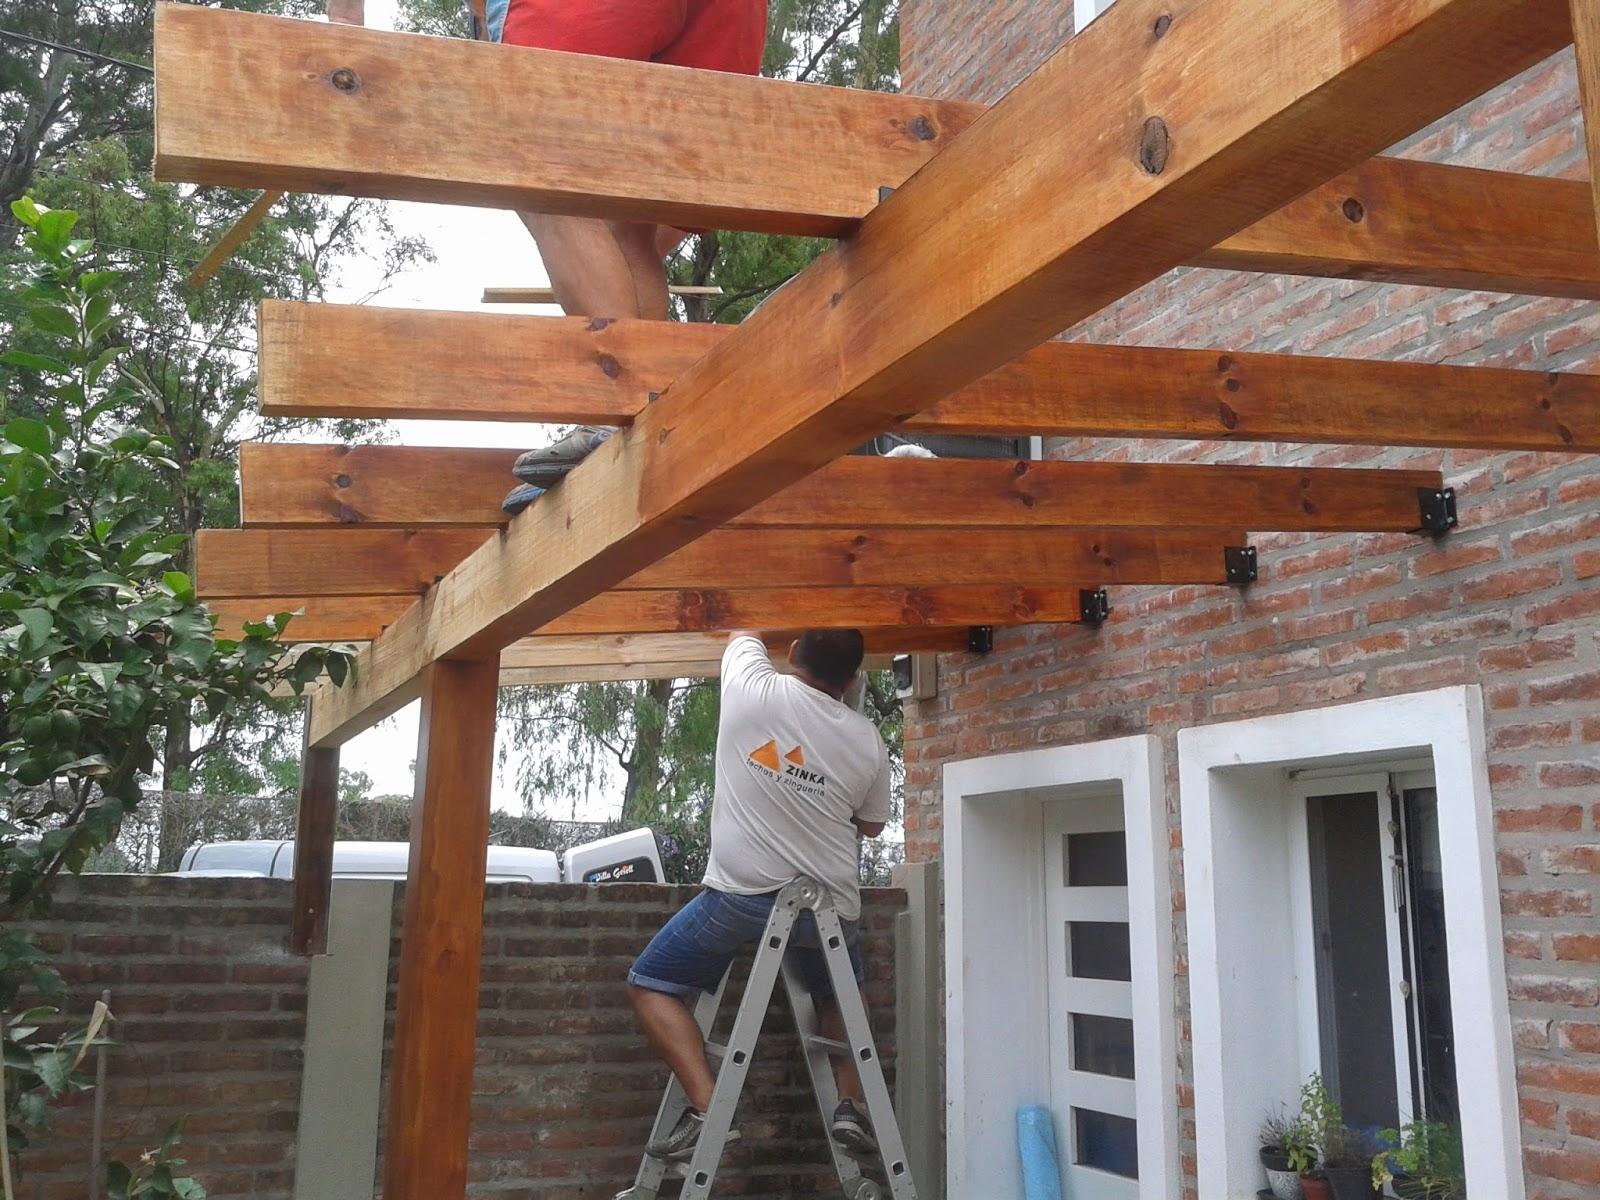 Zinka techos pergolas de madera y metalicas - Madera para pergolas ...